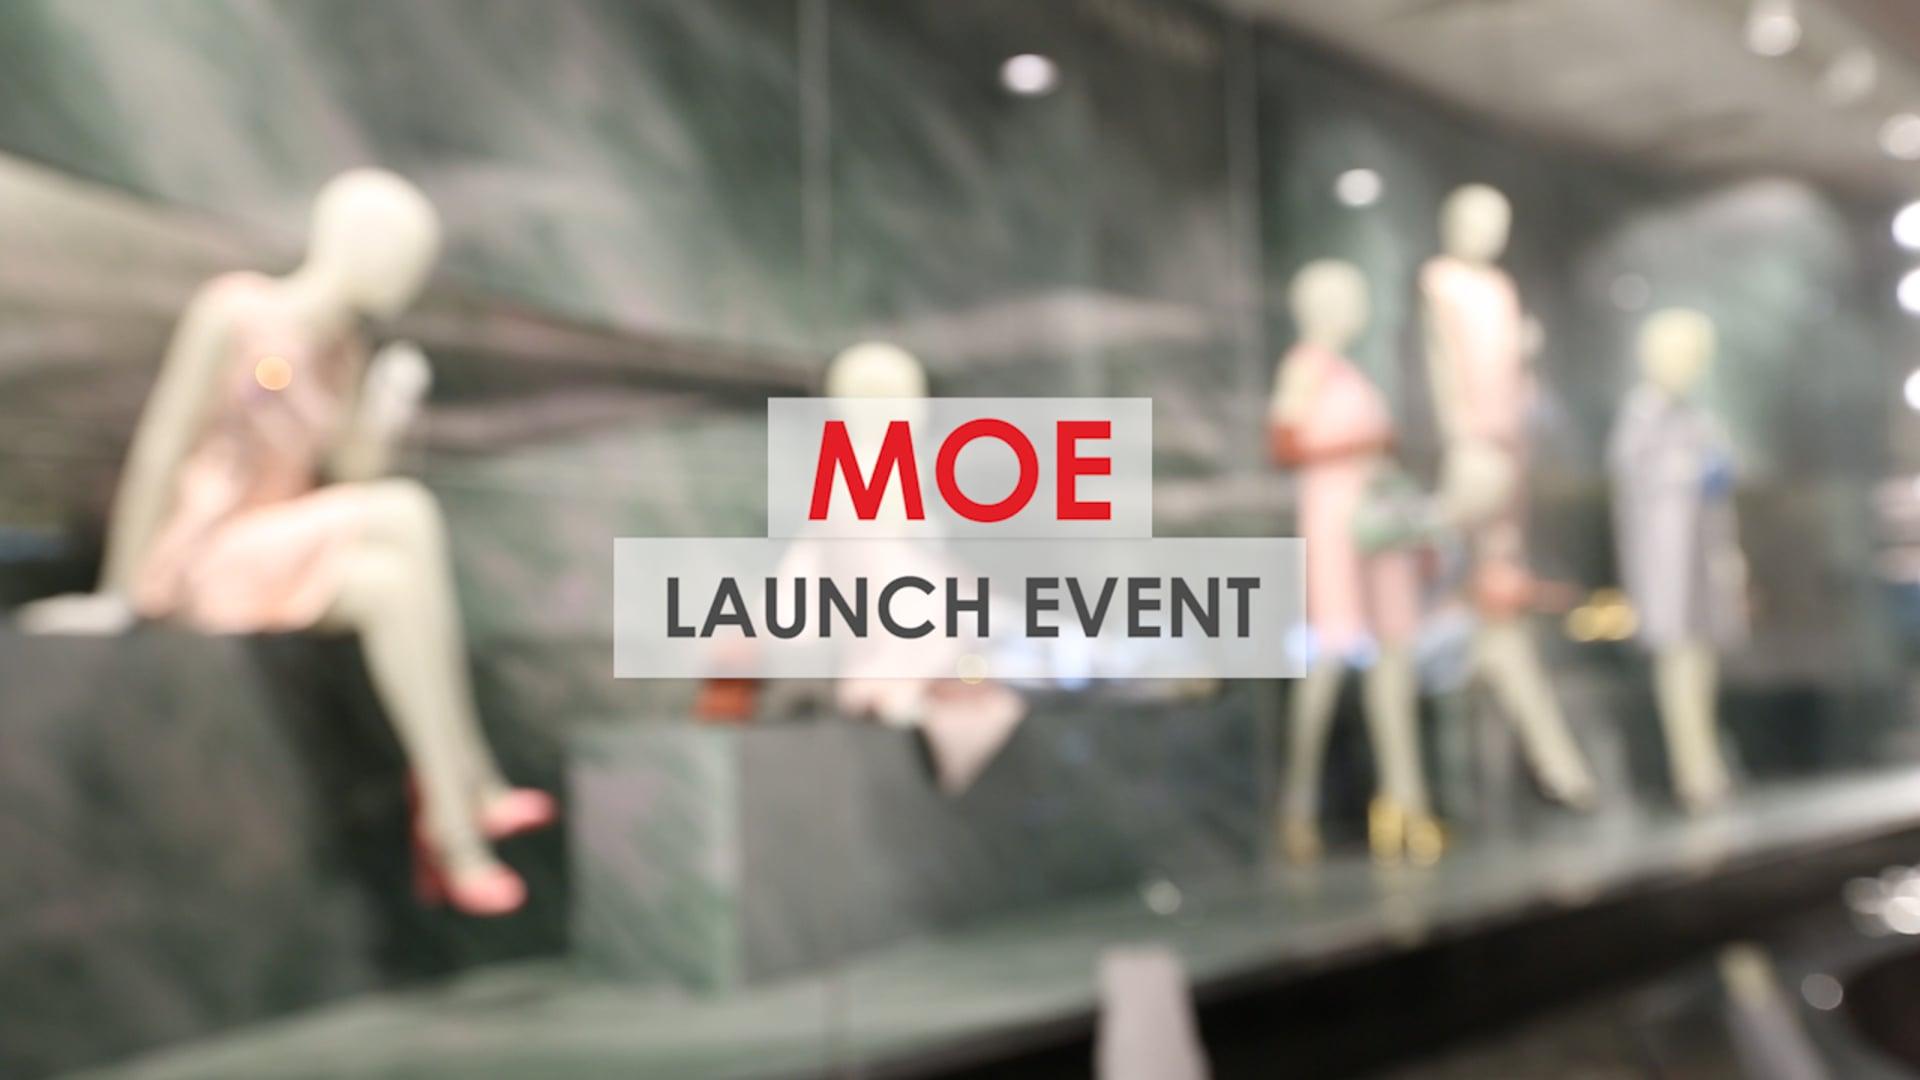 MOE LAUNCH EVENT